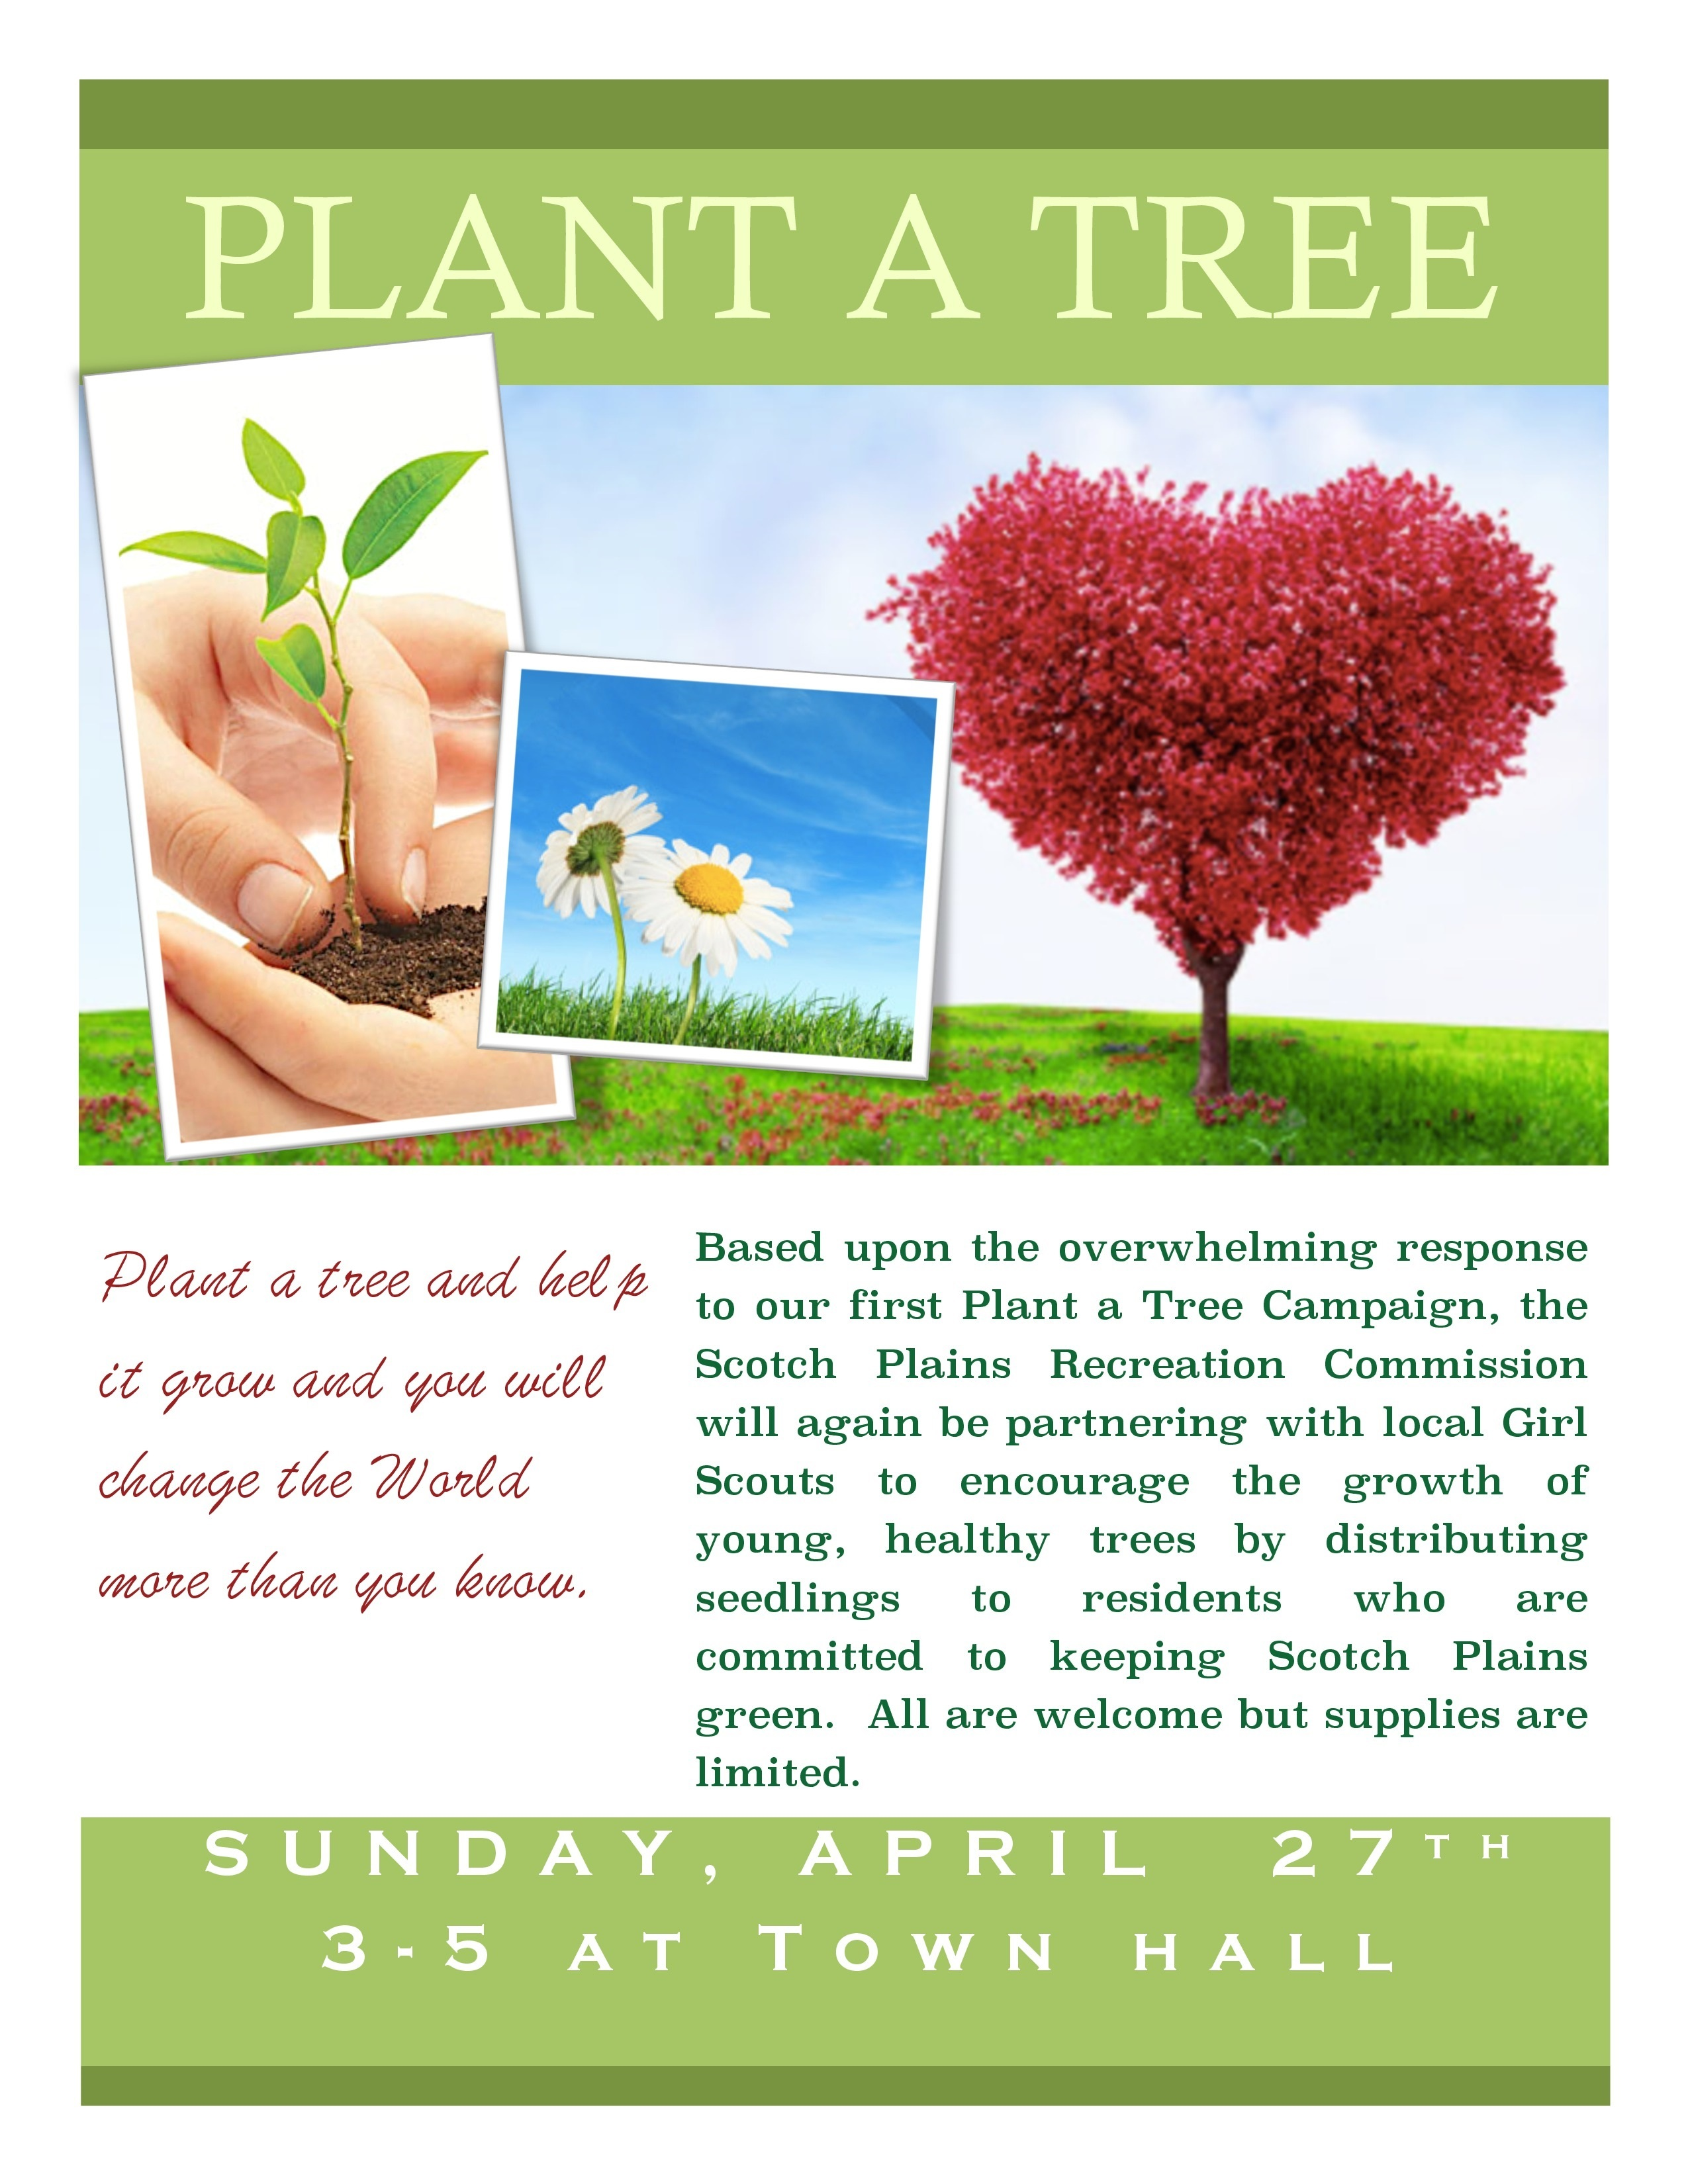 6d06d1ee2f5be1be67a6_Scotch_Plains_Plant_a_Tree.jpg